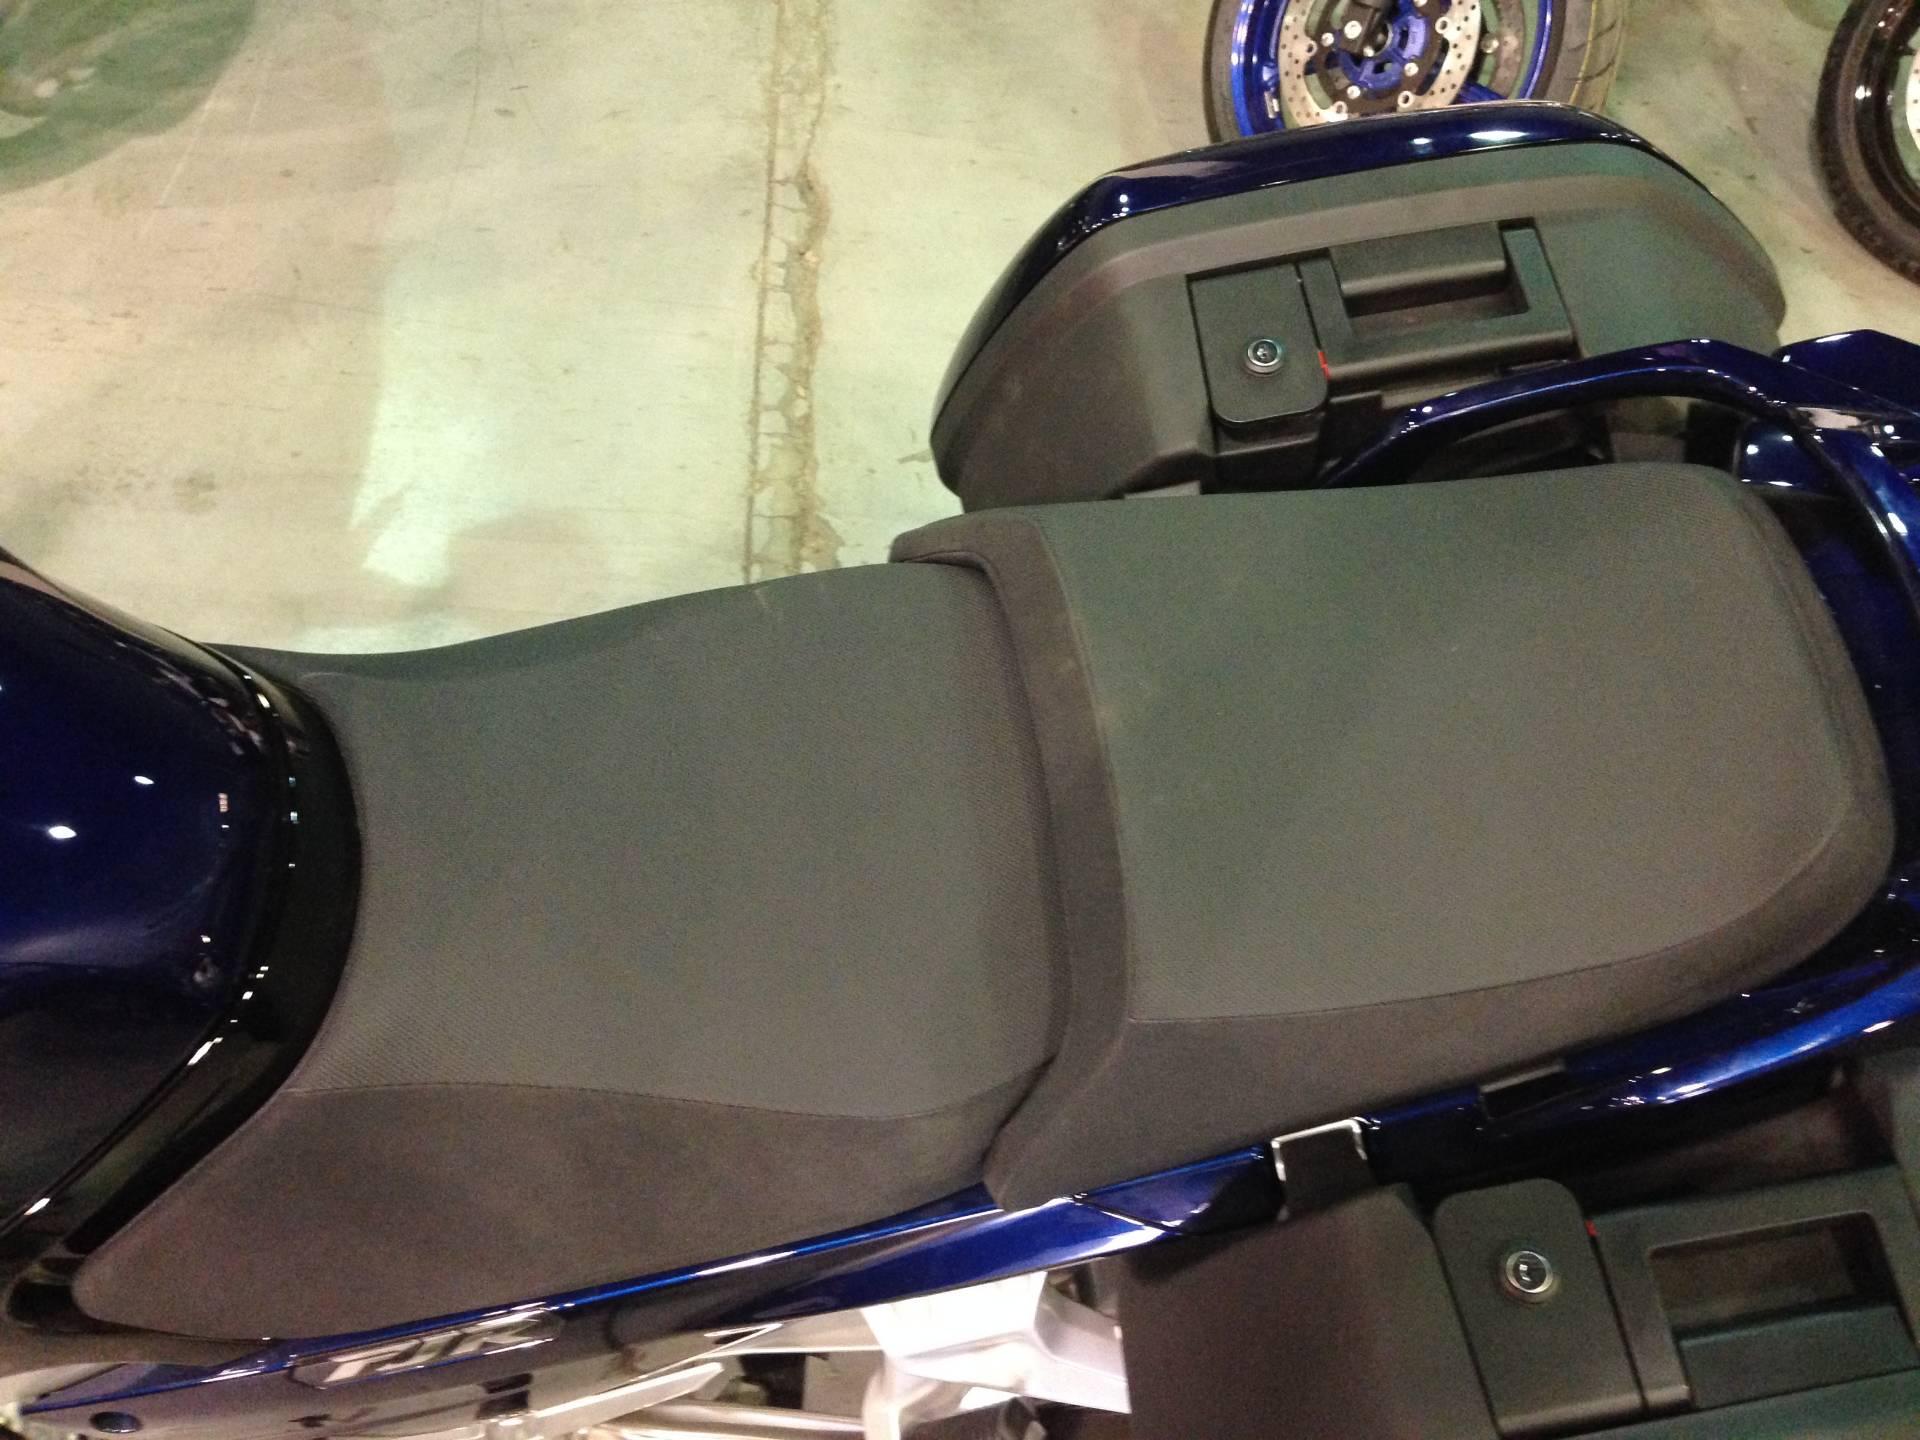 2016 Yamaha FJR1300A 8